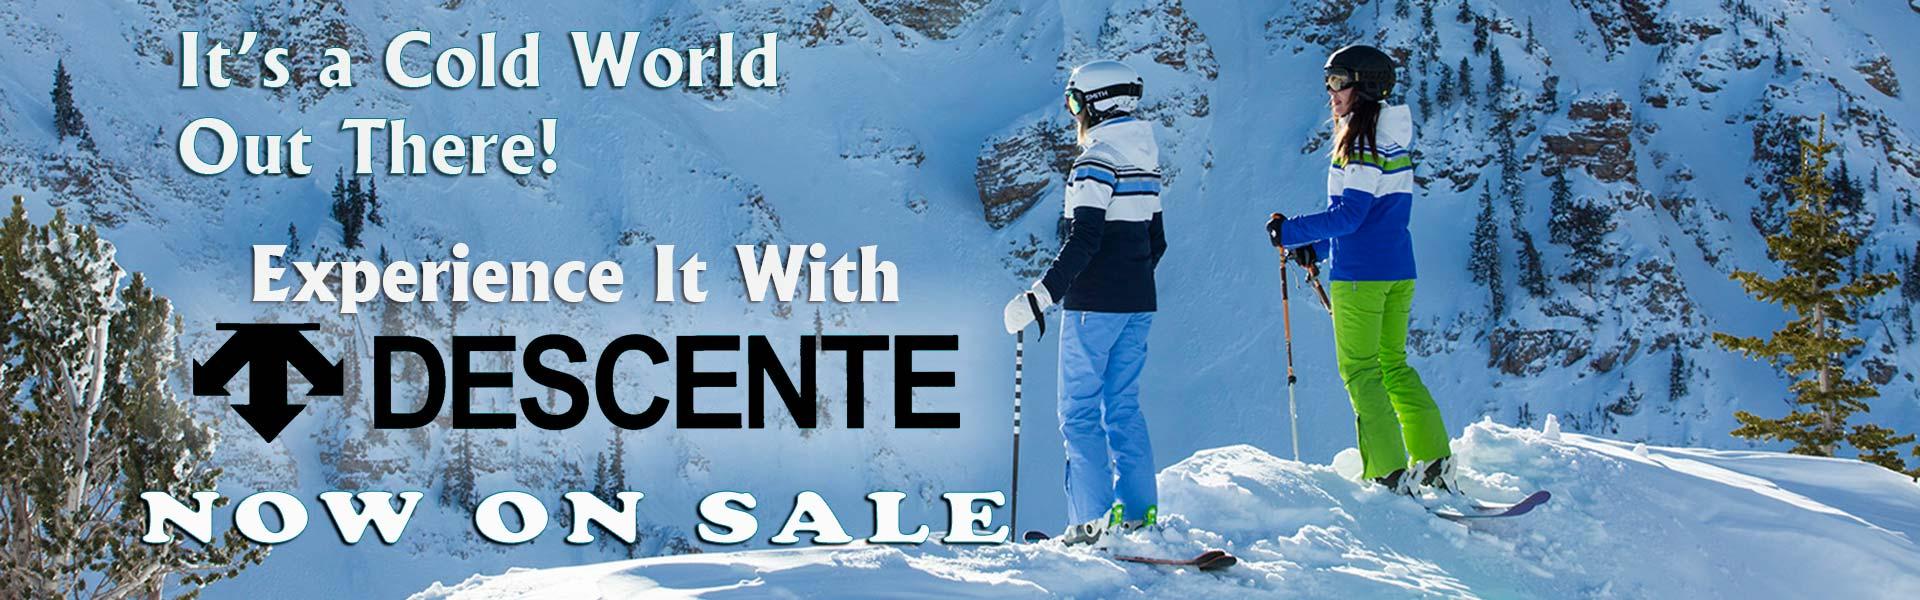 Descente Ski Clothing On Sale